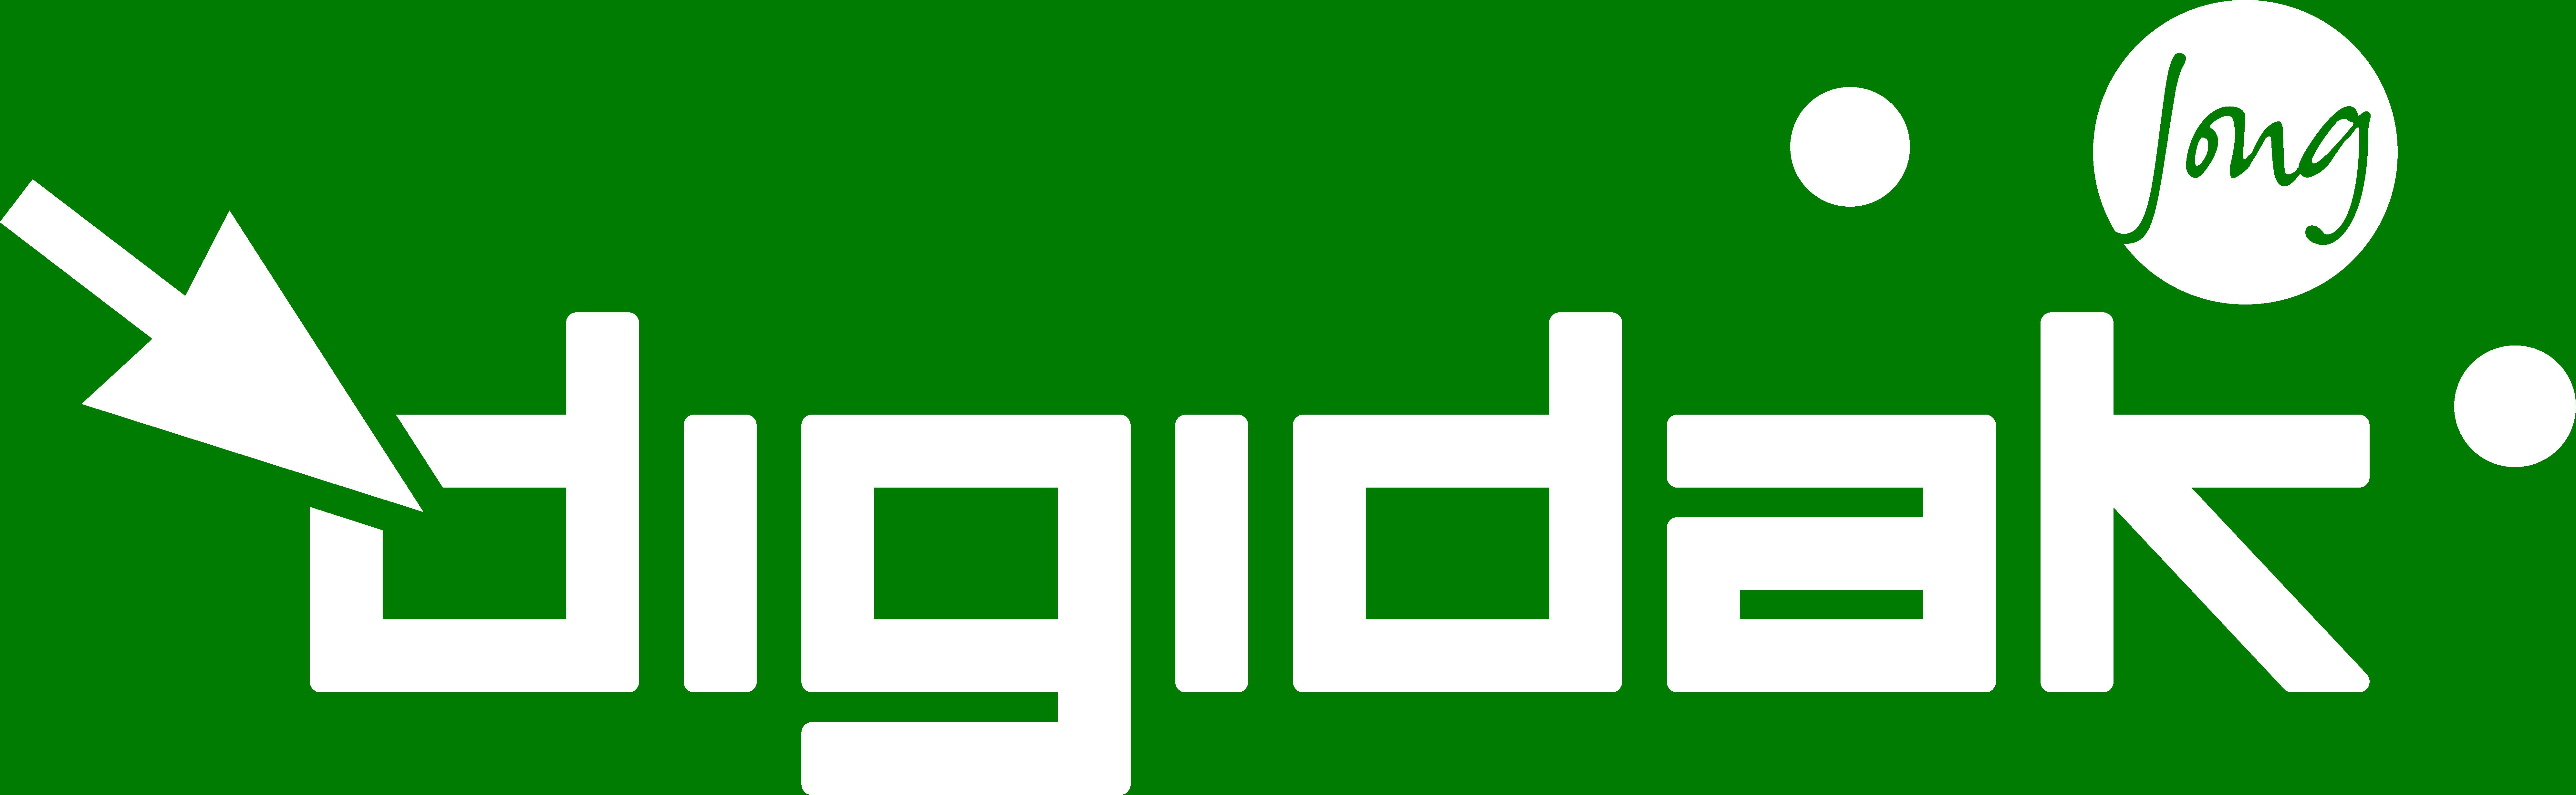 Jongdigidak logo wit